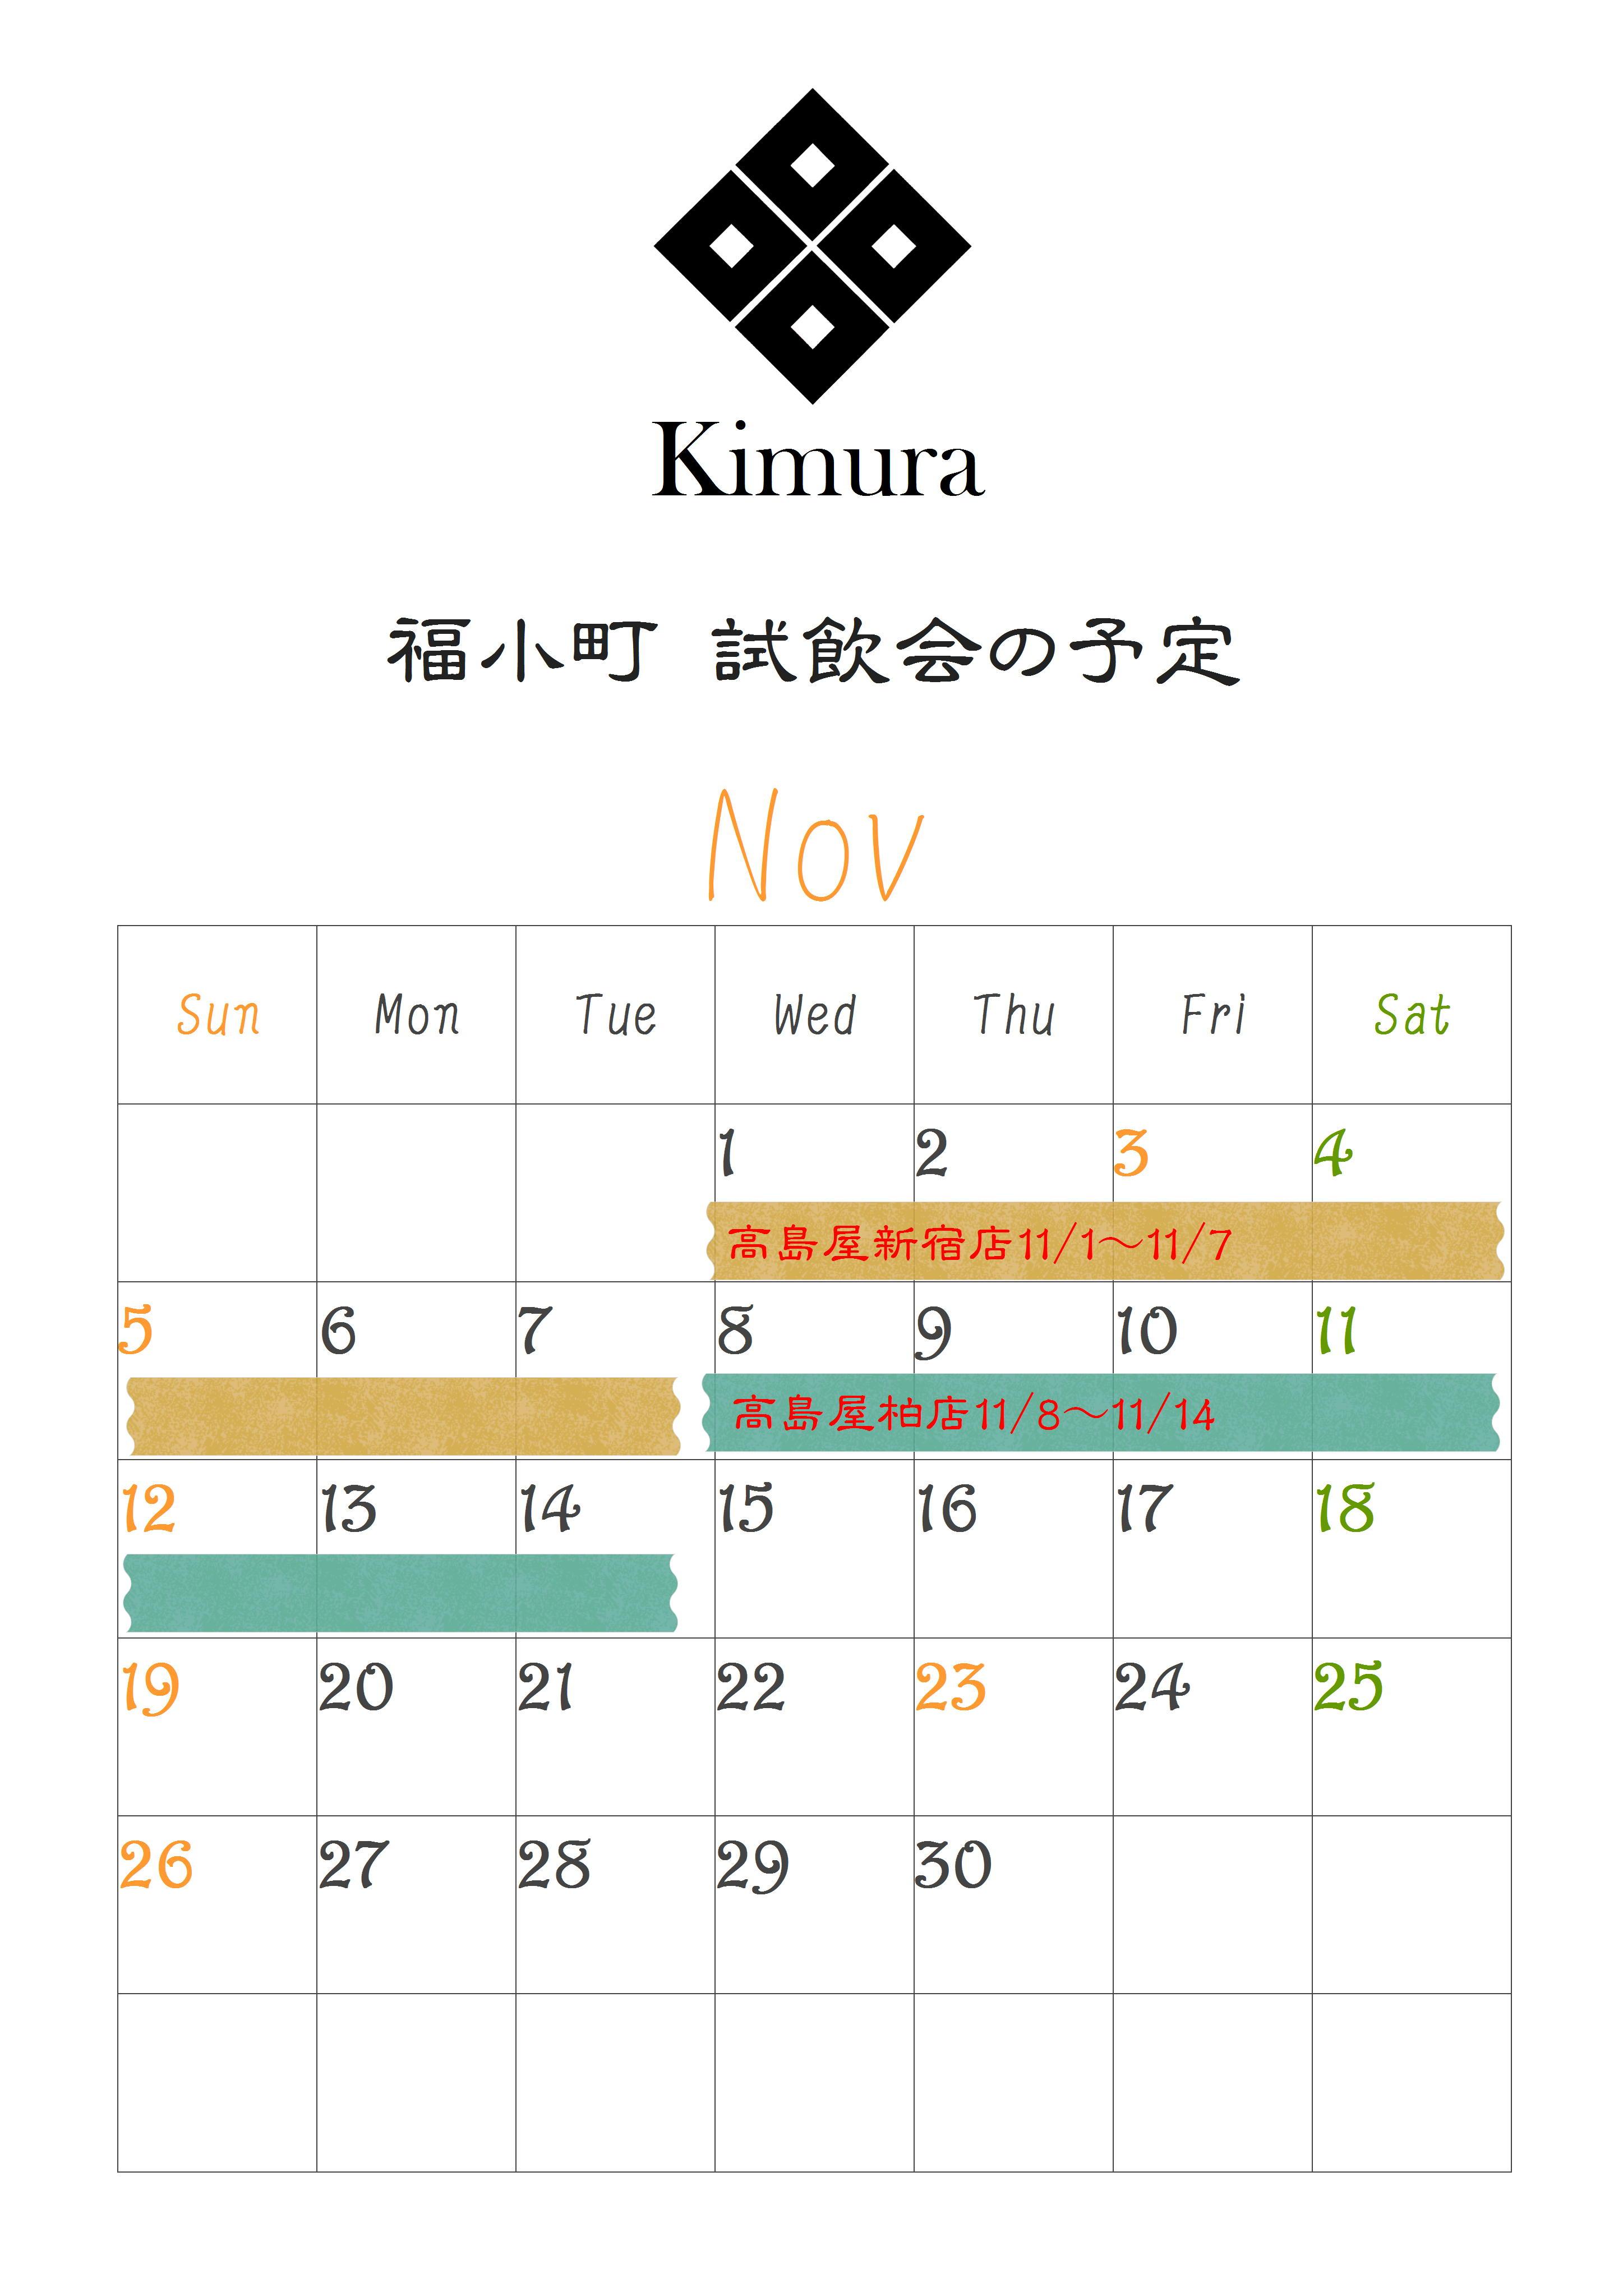 http://www.fukukomachi.com/blog/photo/20171102-3.JPG